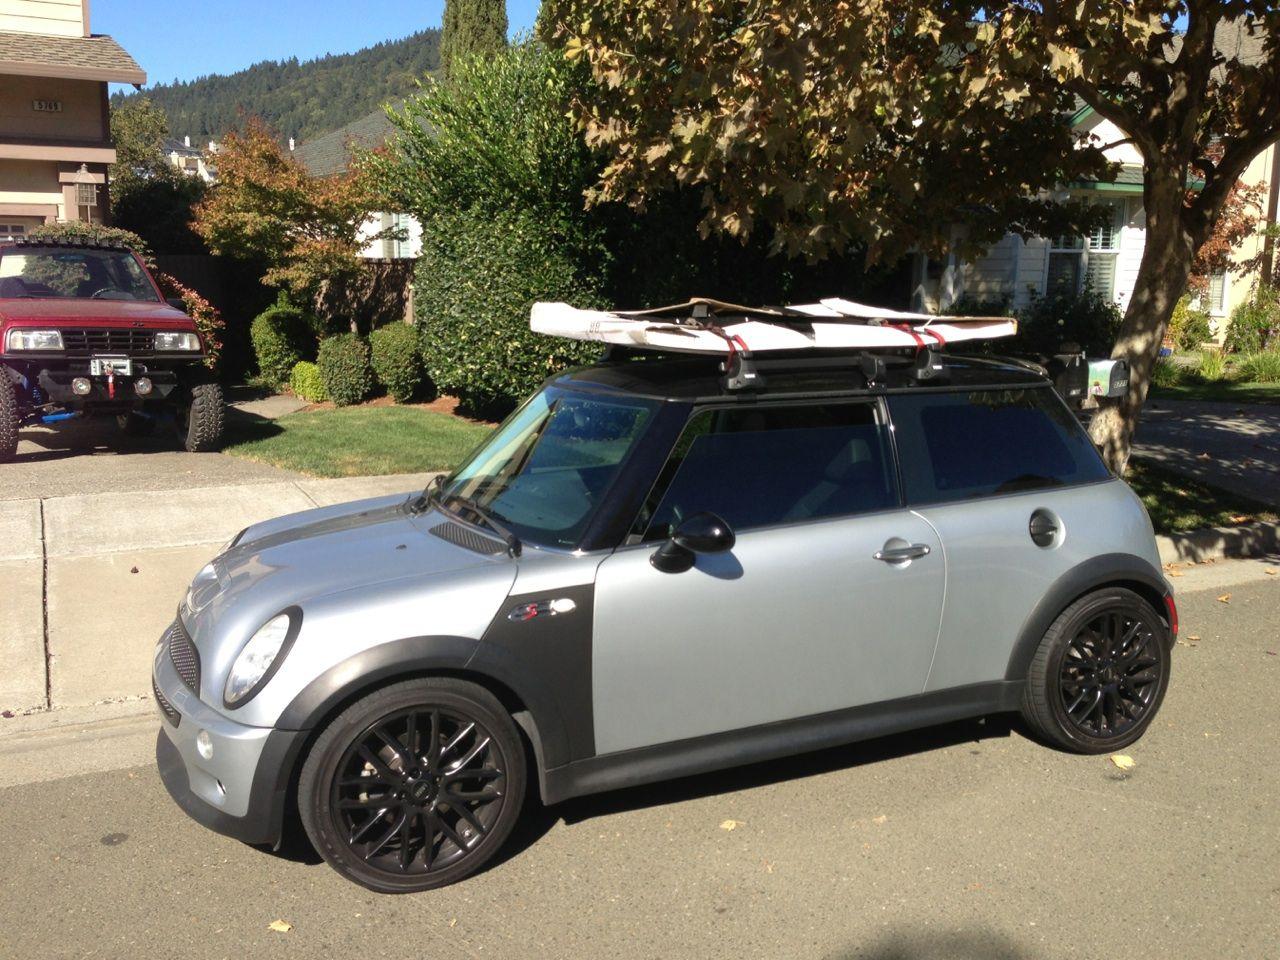 MINI COOPER S ROOF RACK USE | The Garage | Pinterest ...